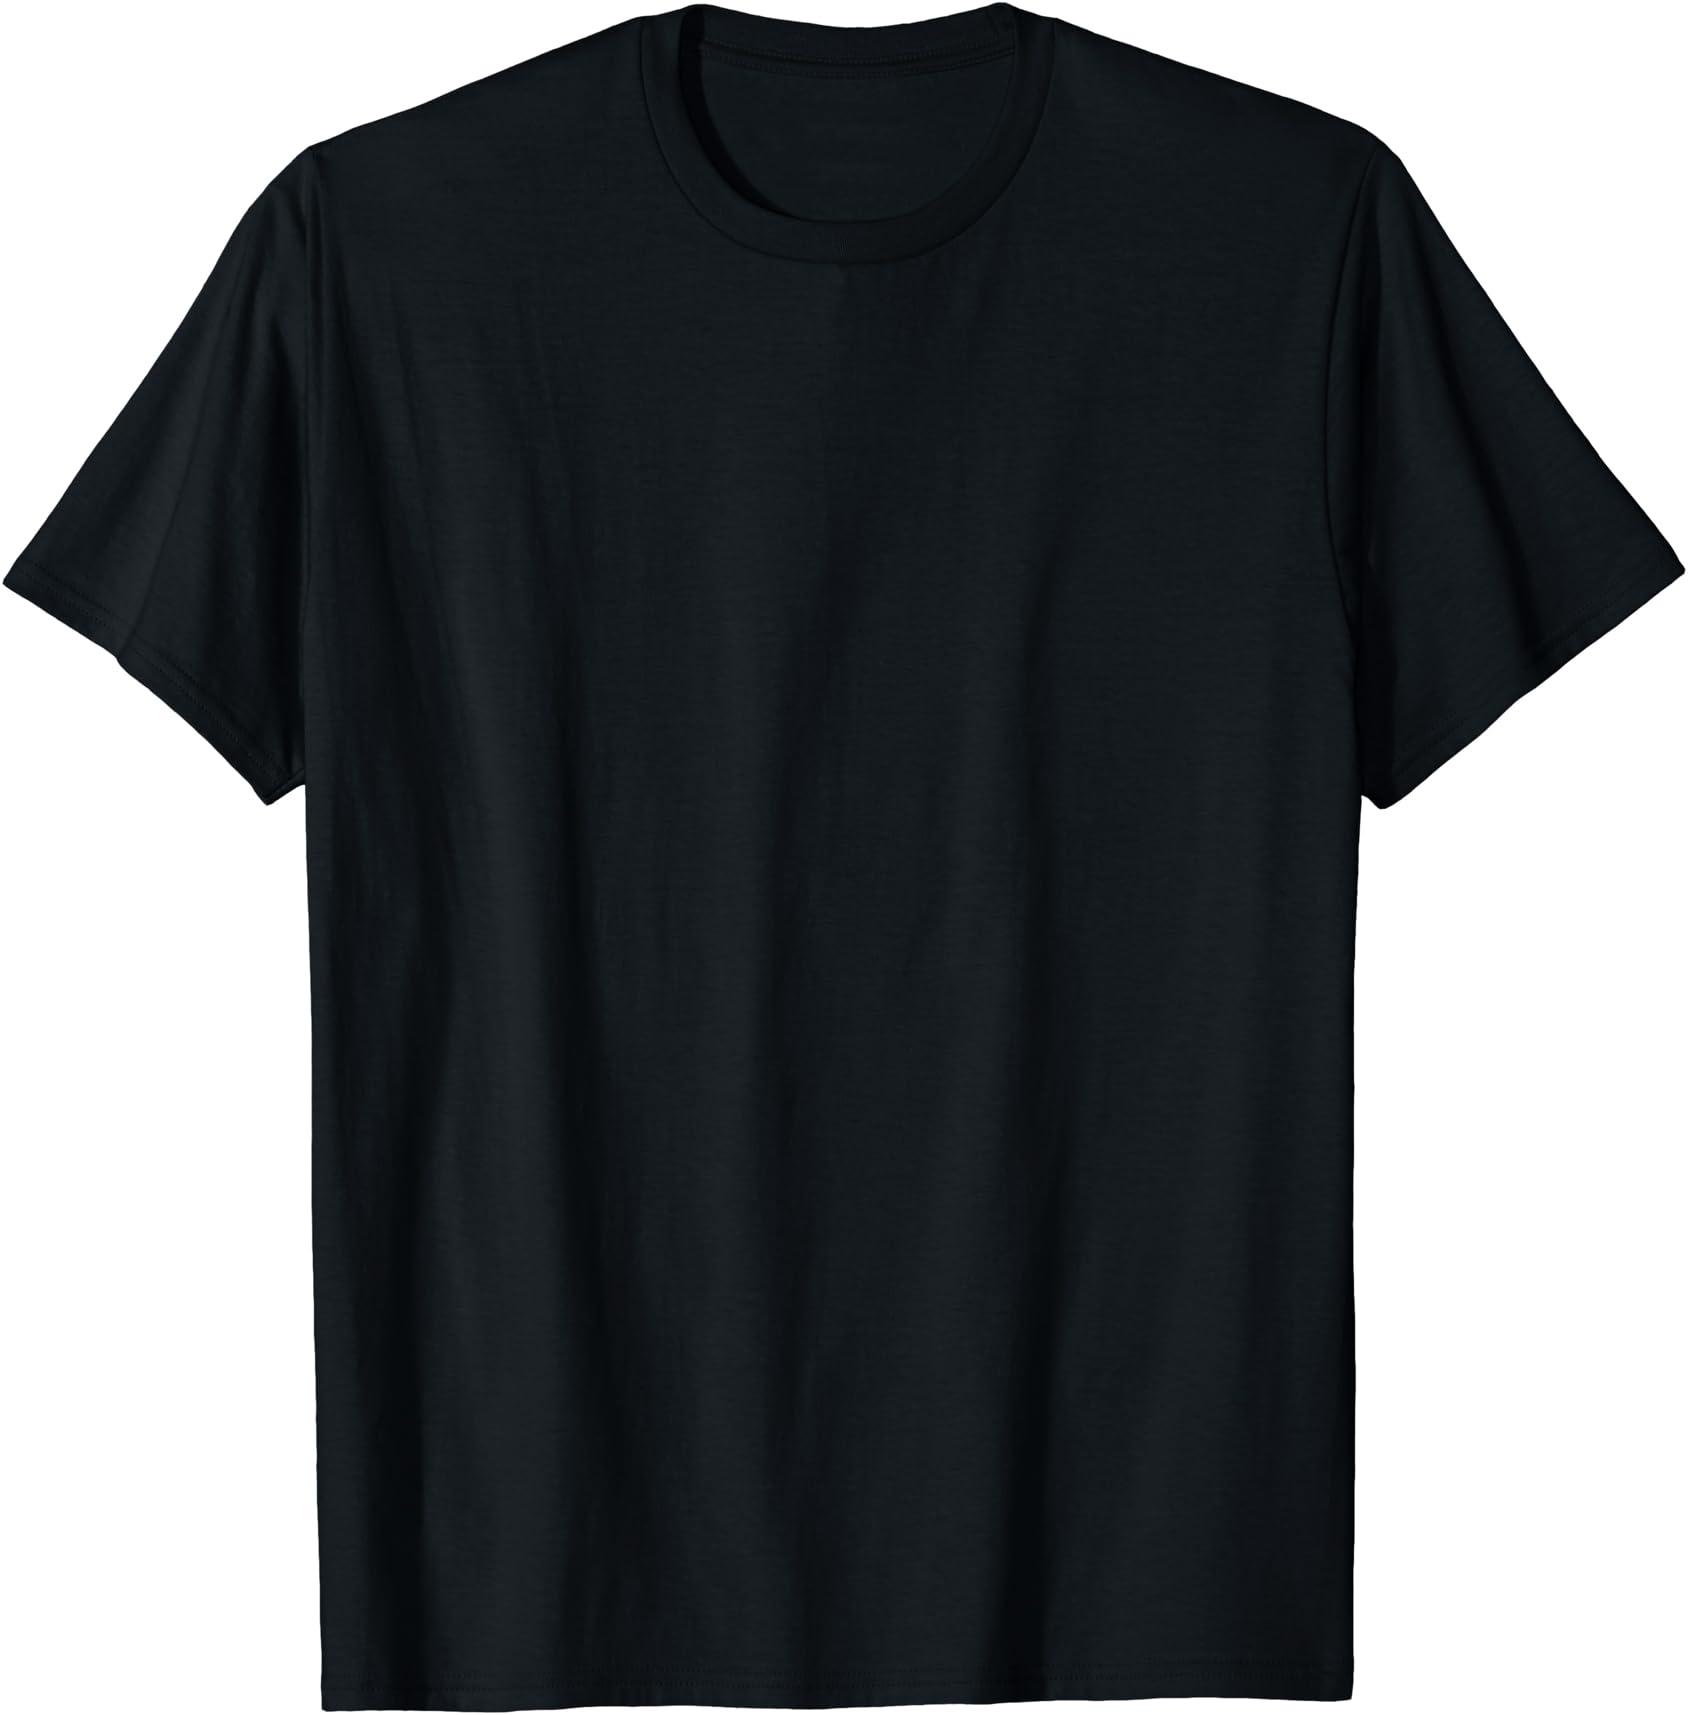 Sagat Muay Thai Training Gym Martial Arts MMA Mens Black Cotton T-shirt Top Tee